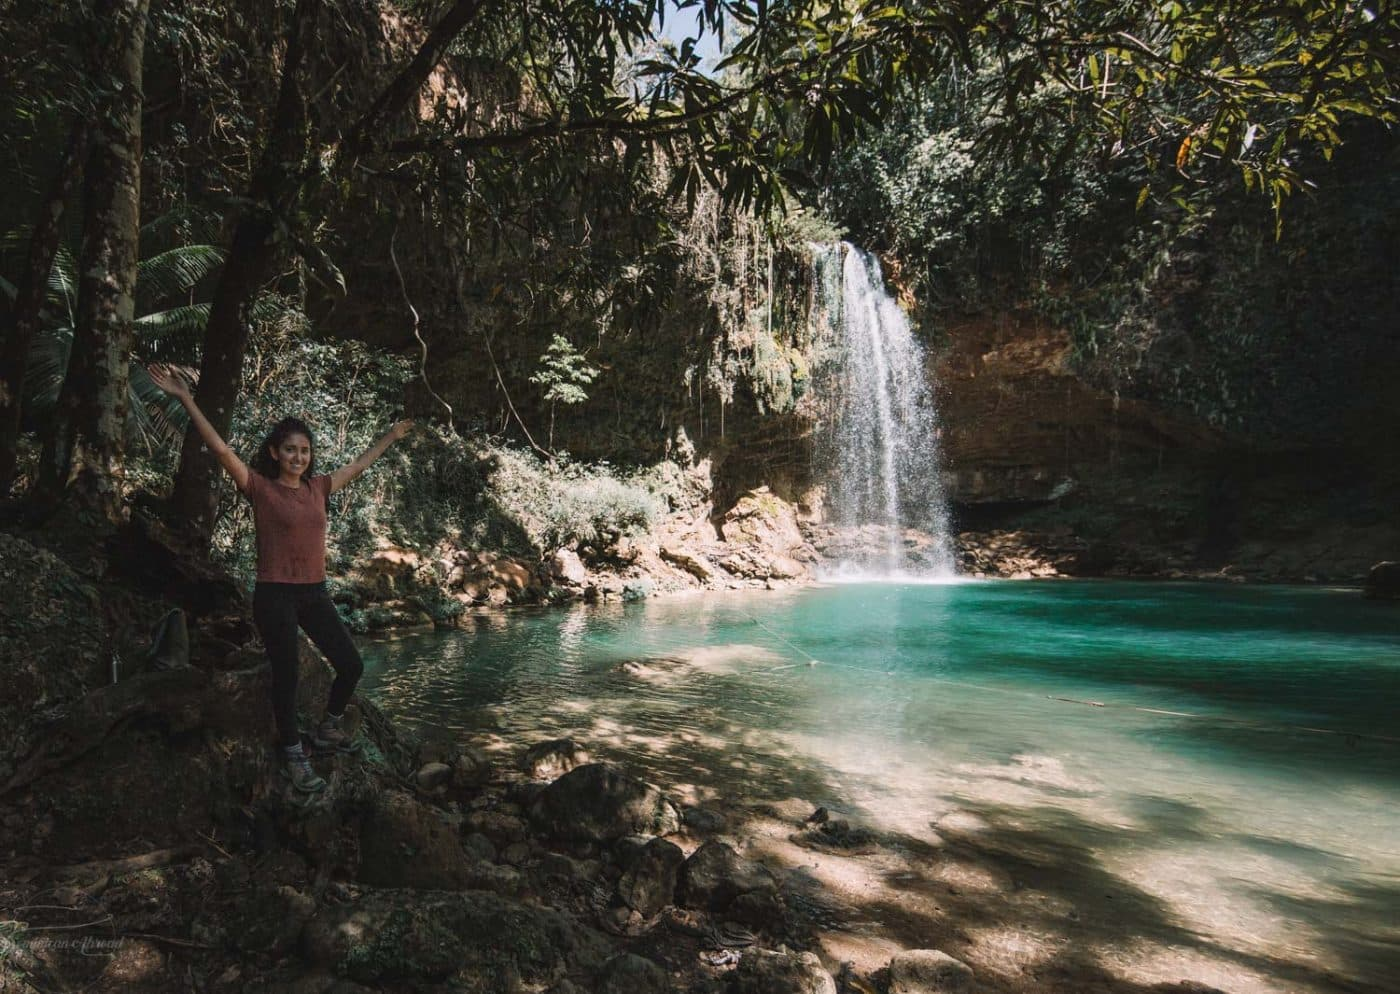 The beautiful blue waters of Salto de Socoa waterfall in the Dominican Republic.